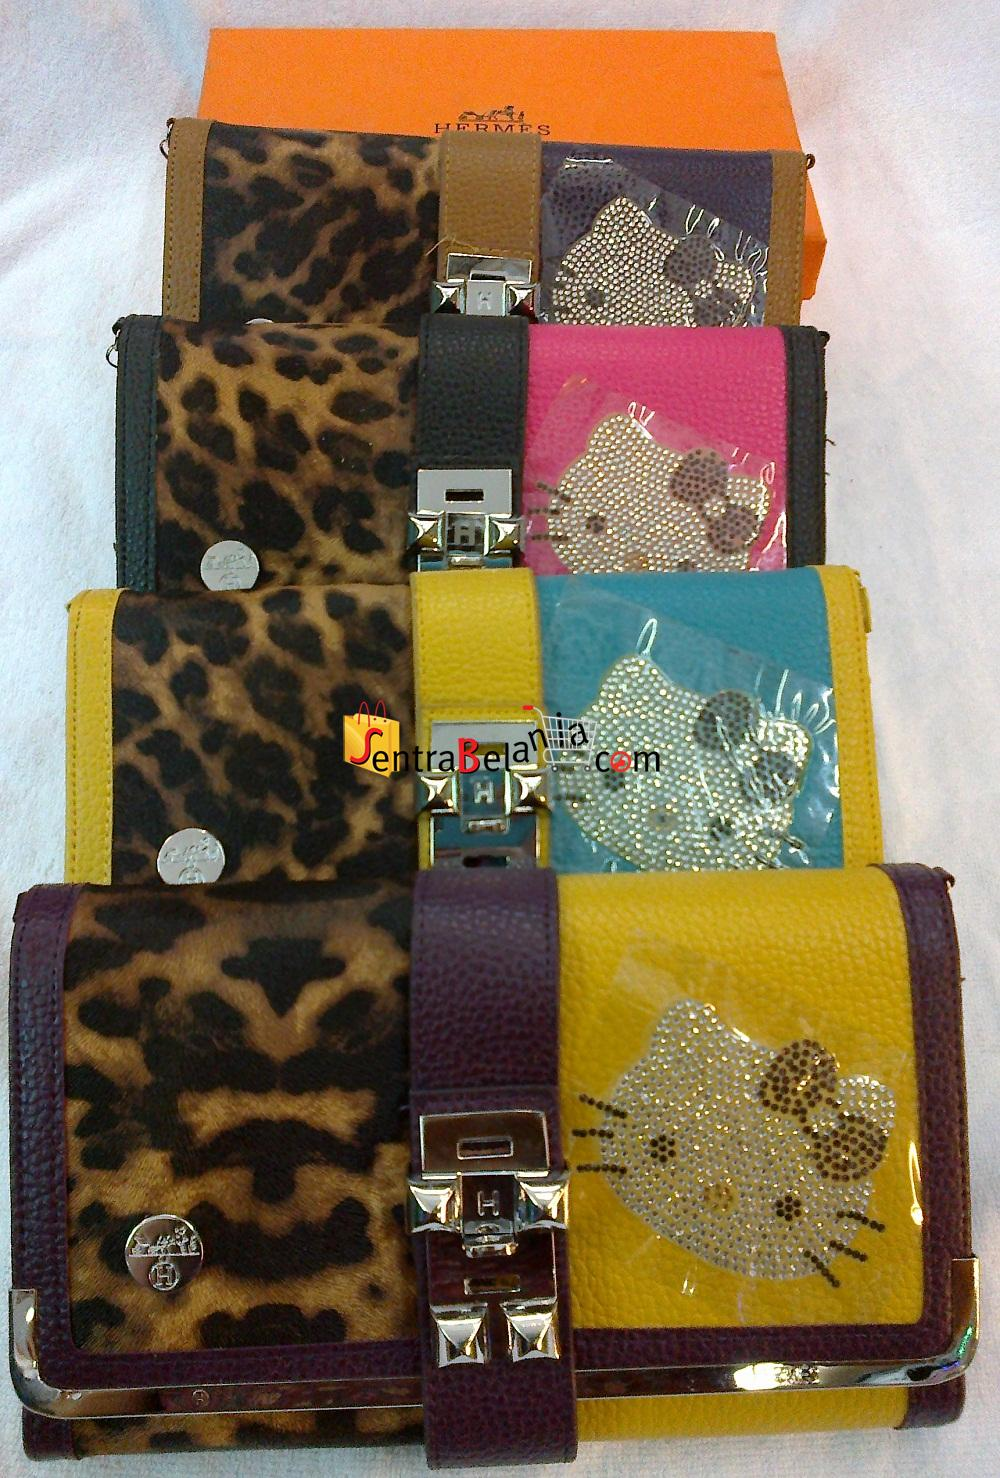 Dompet Hermes Hello Kitty Leopard 1 Colour